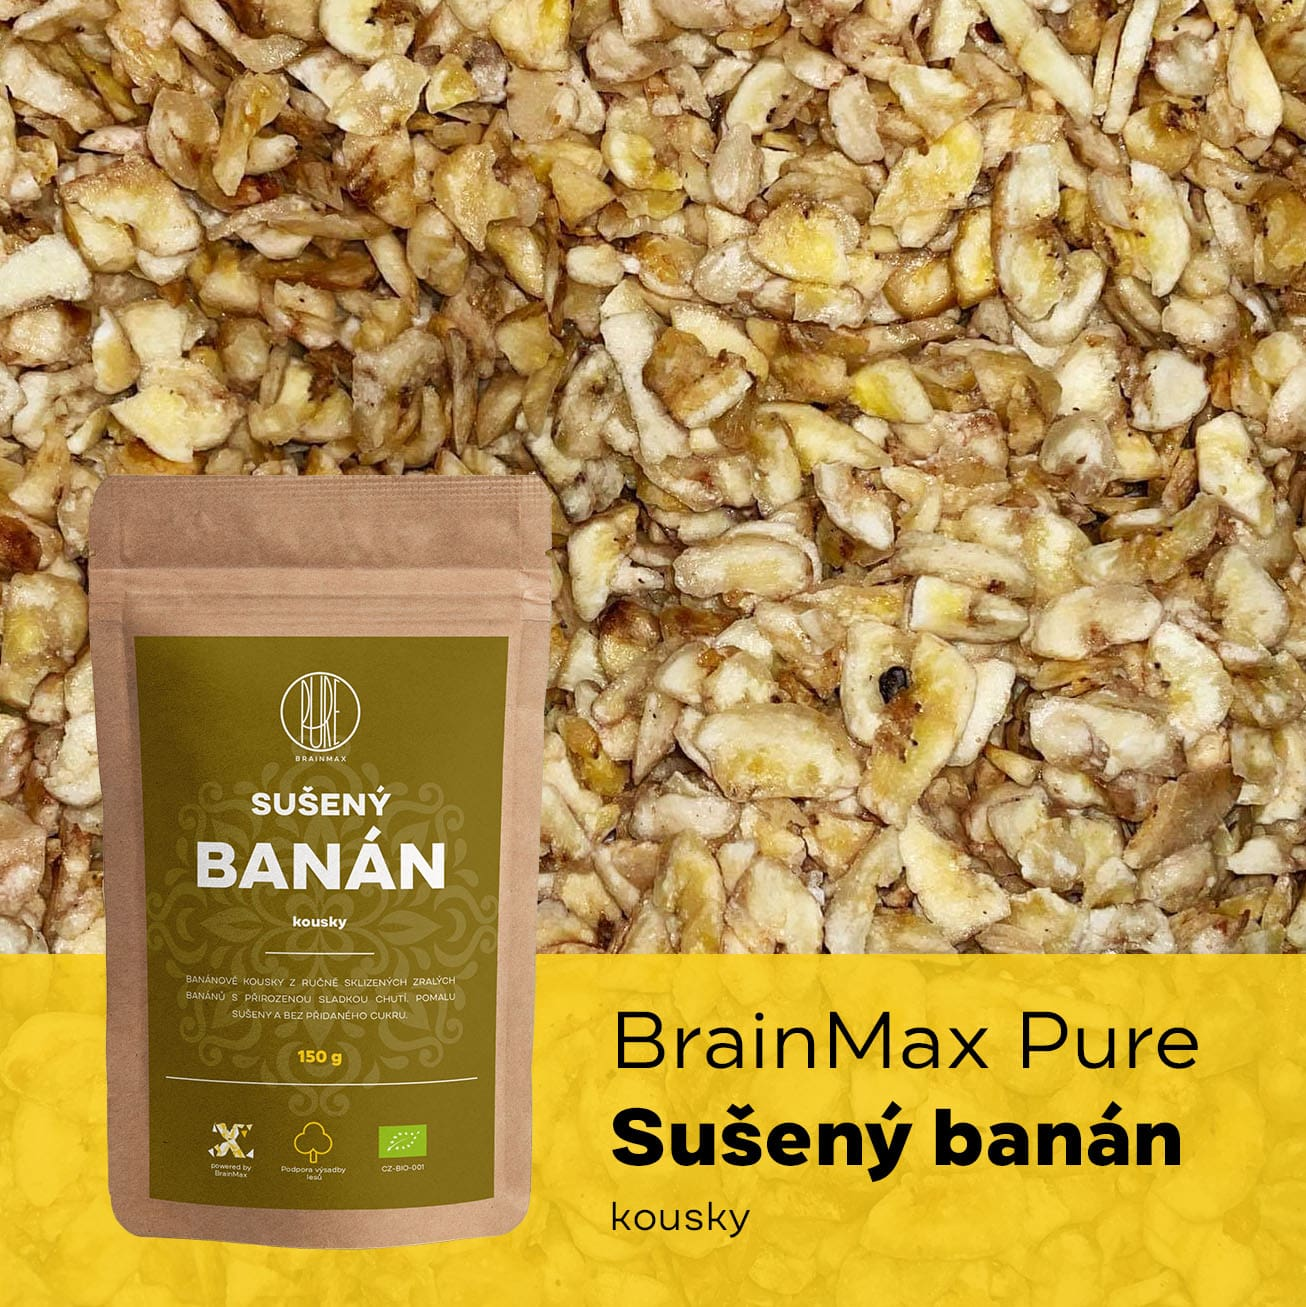 BrainMax Pure Sušený banán kousky - BrainMarket.cz